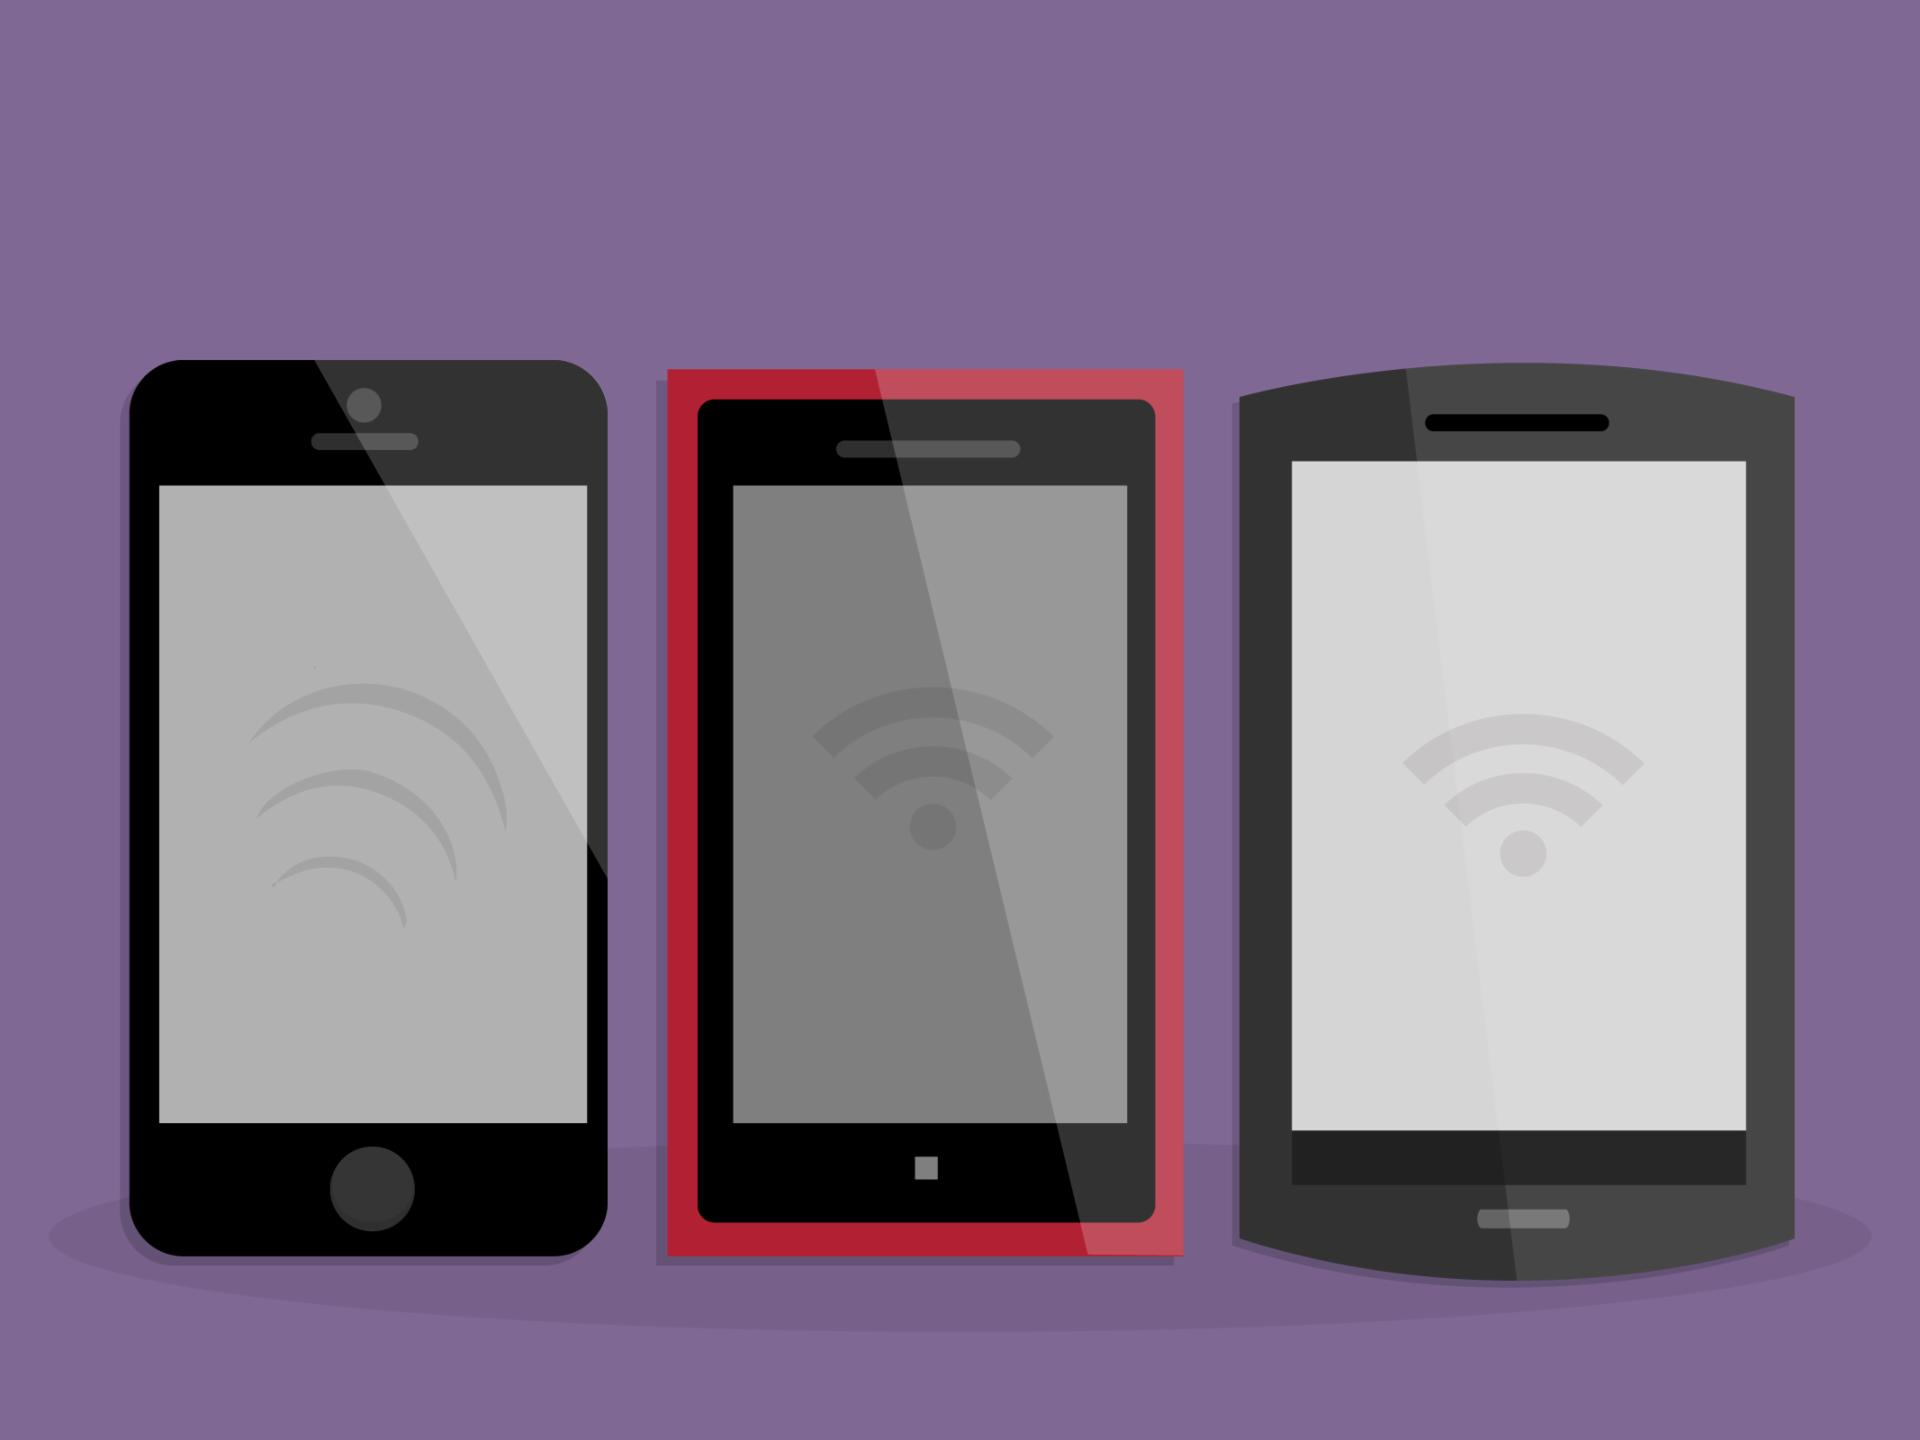 Dispositivos móviles como teléfonos inteligentes o smartphones.